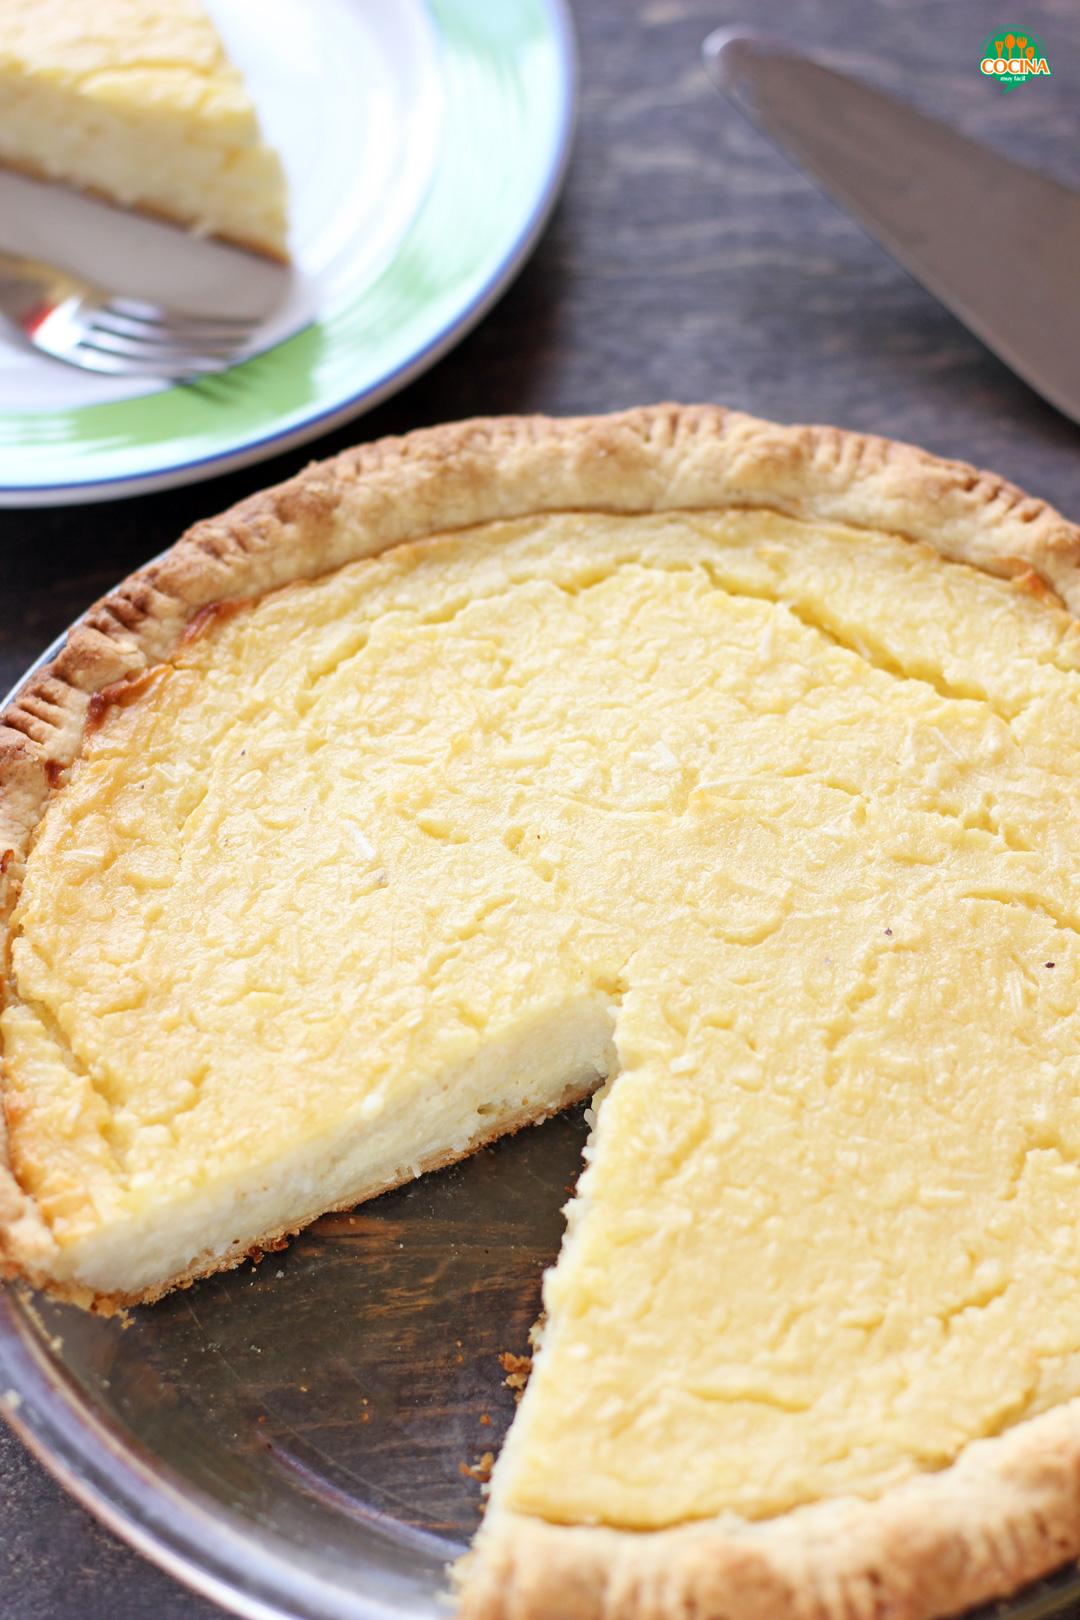 Tarta de coco o Pay de coco | cocinamuyfacil.com